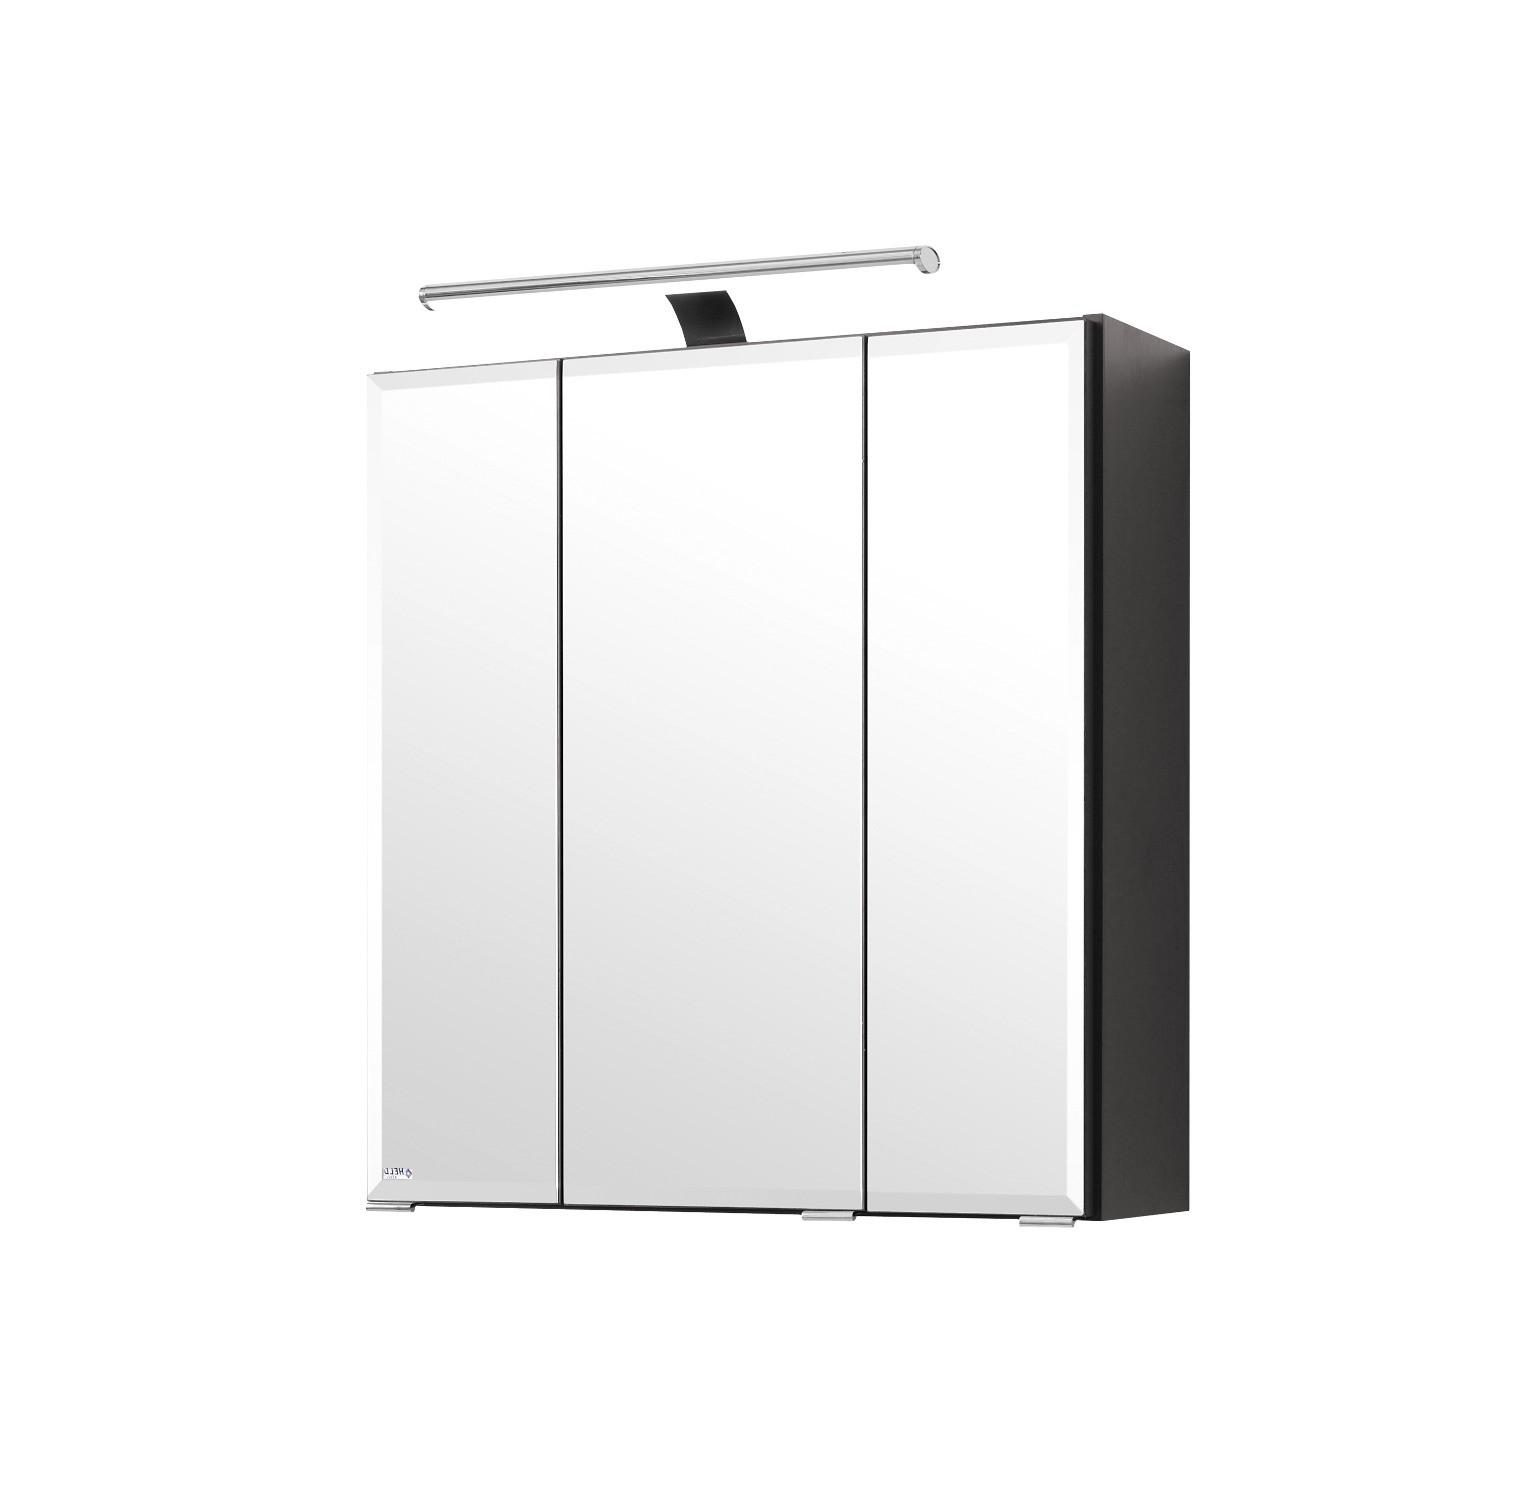 badm bel set belluno mit waschtisch 6 teilig 140 cm. Black Bedroom Furniture Sets. Home Design Ideas